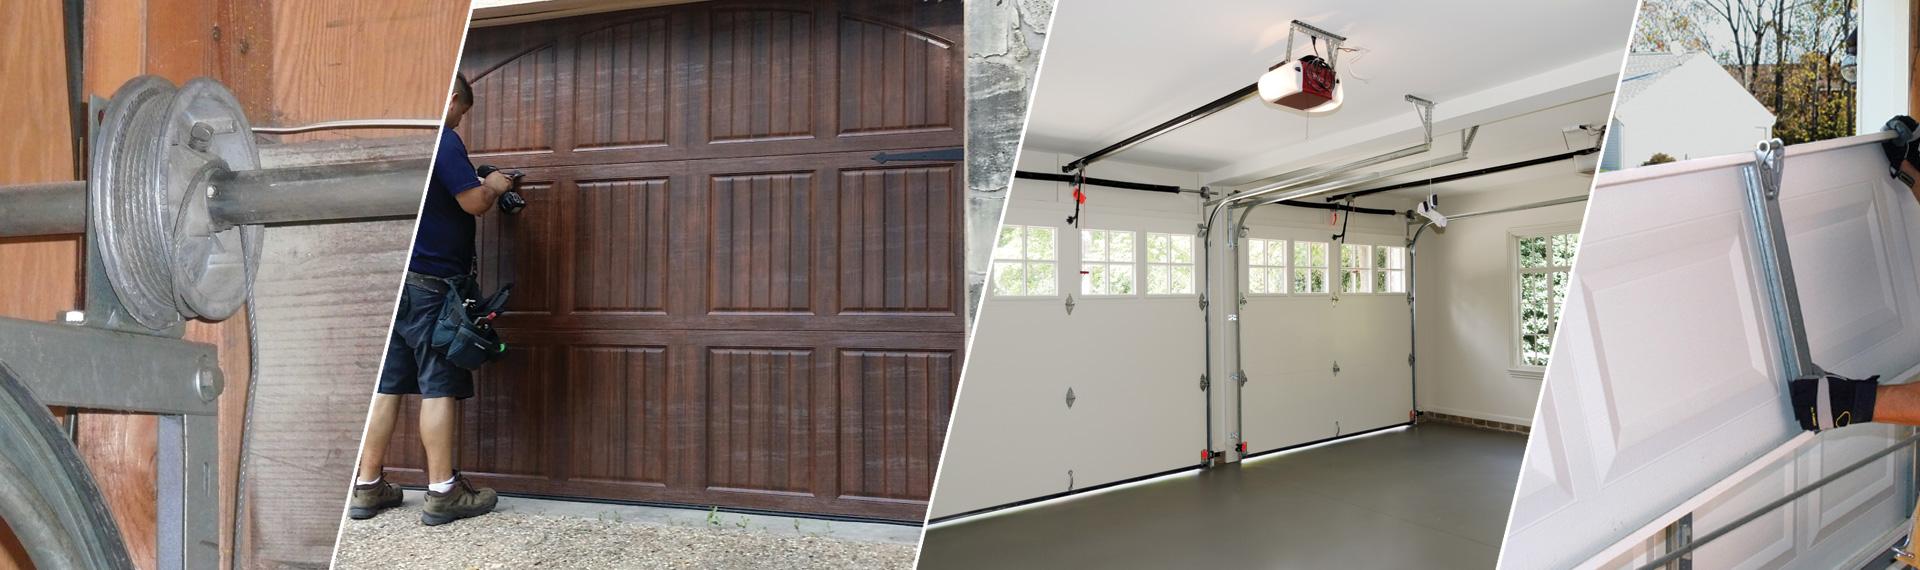 All Garage Door Services Bellmawr NJ